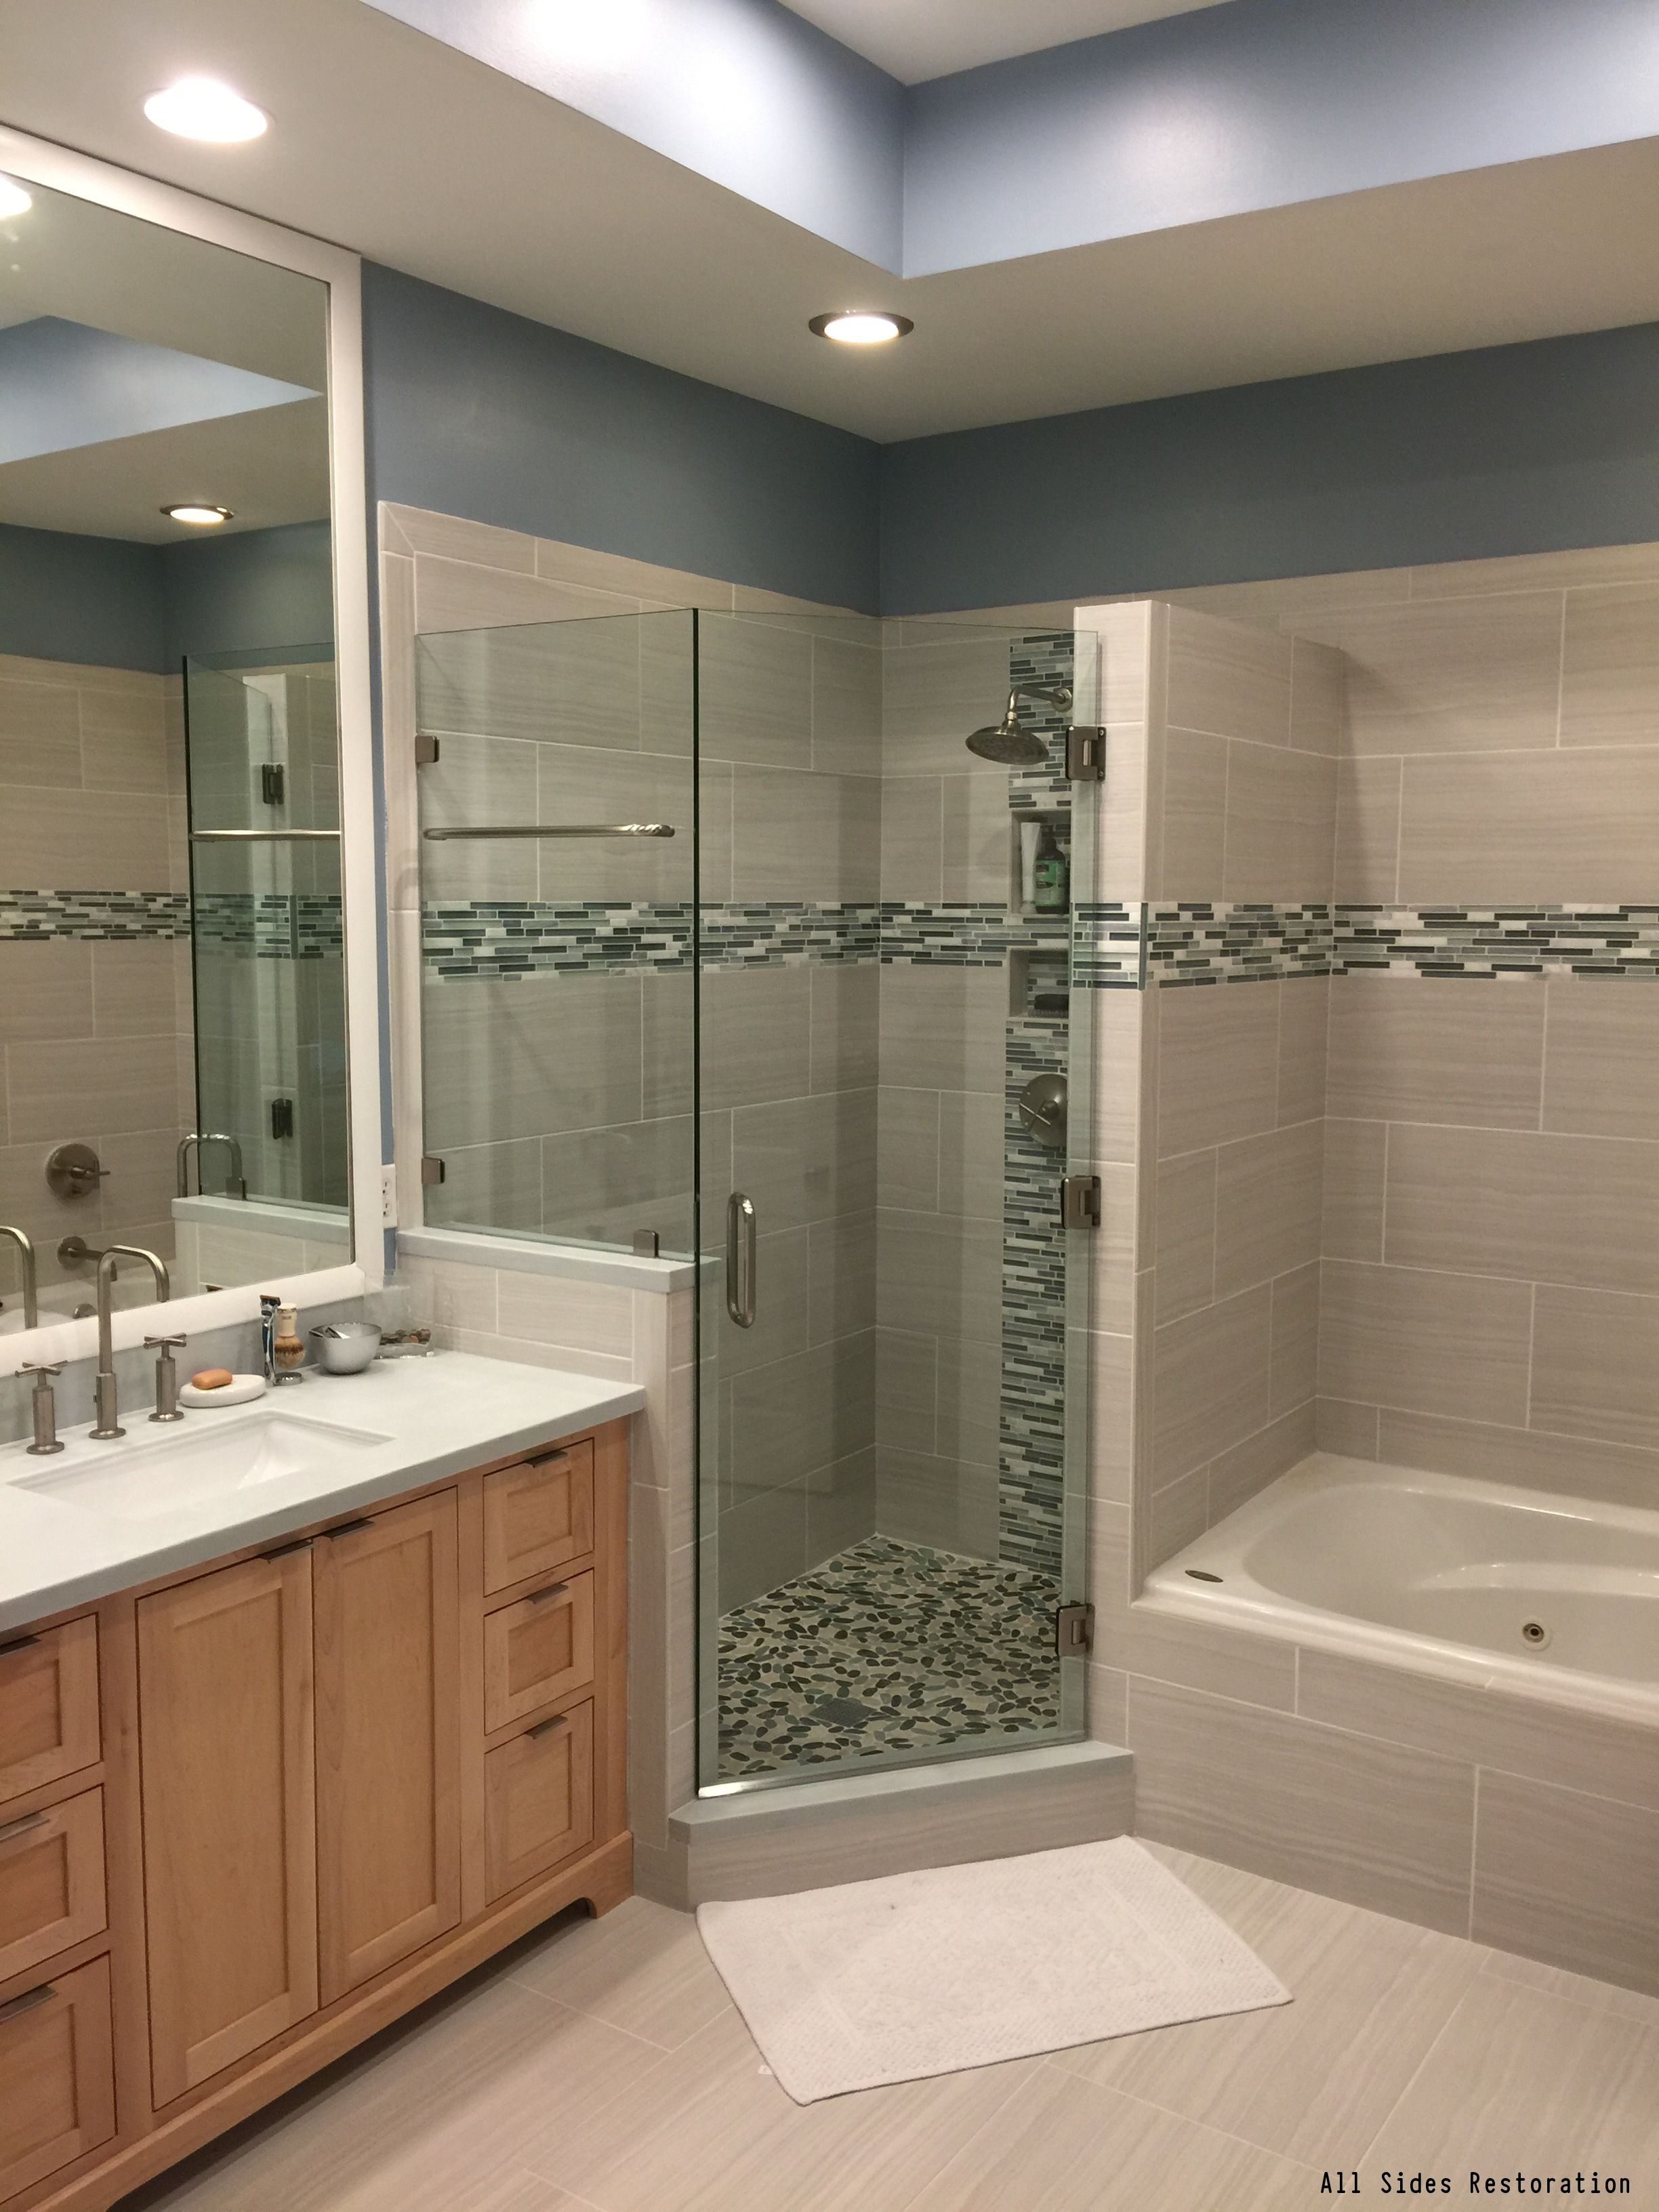 Renovating Fixing Decorating Painting Ideas: Best Bathroom Paint Colors, Bathroom